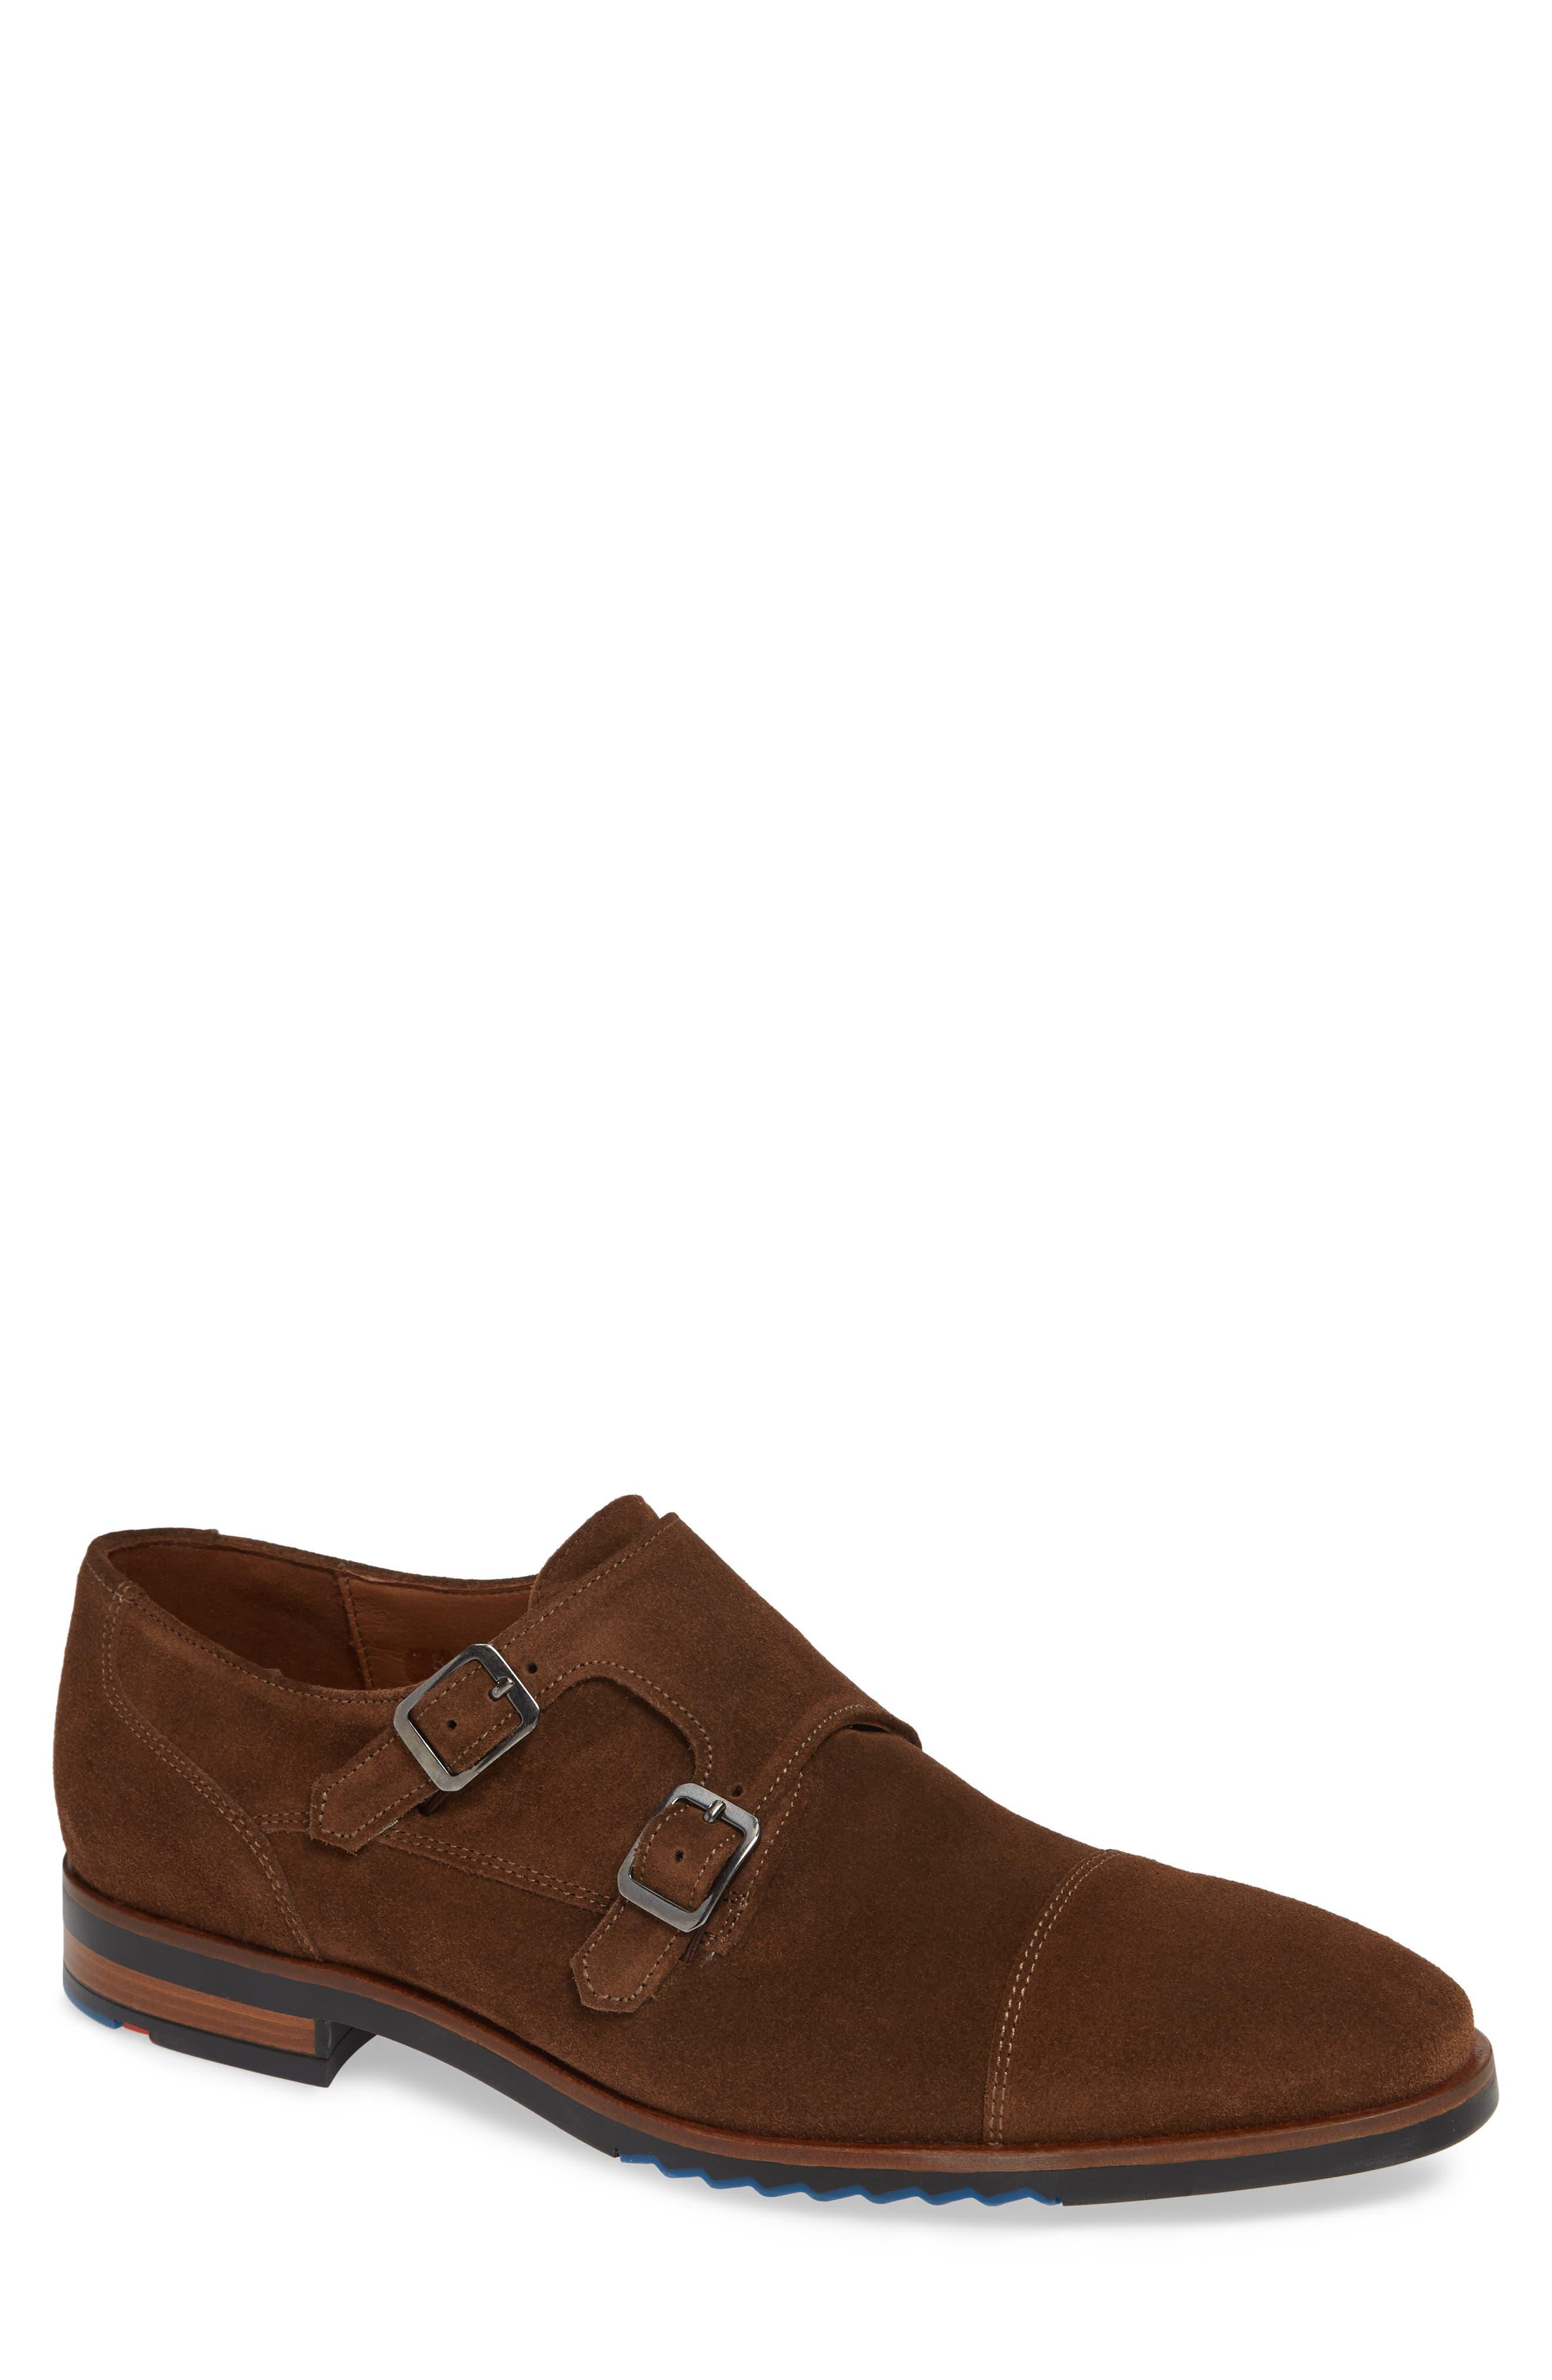 Darrow Double Monk Strap Shoe,                             Main thumbnail 1, color,                             CIGAR BROWN SUEDE